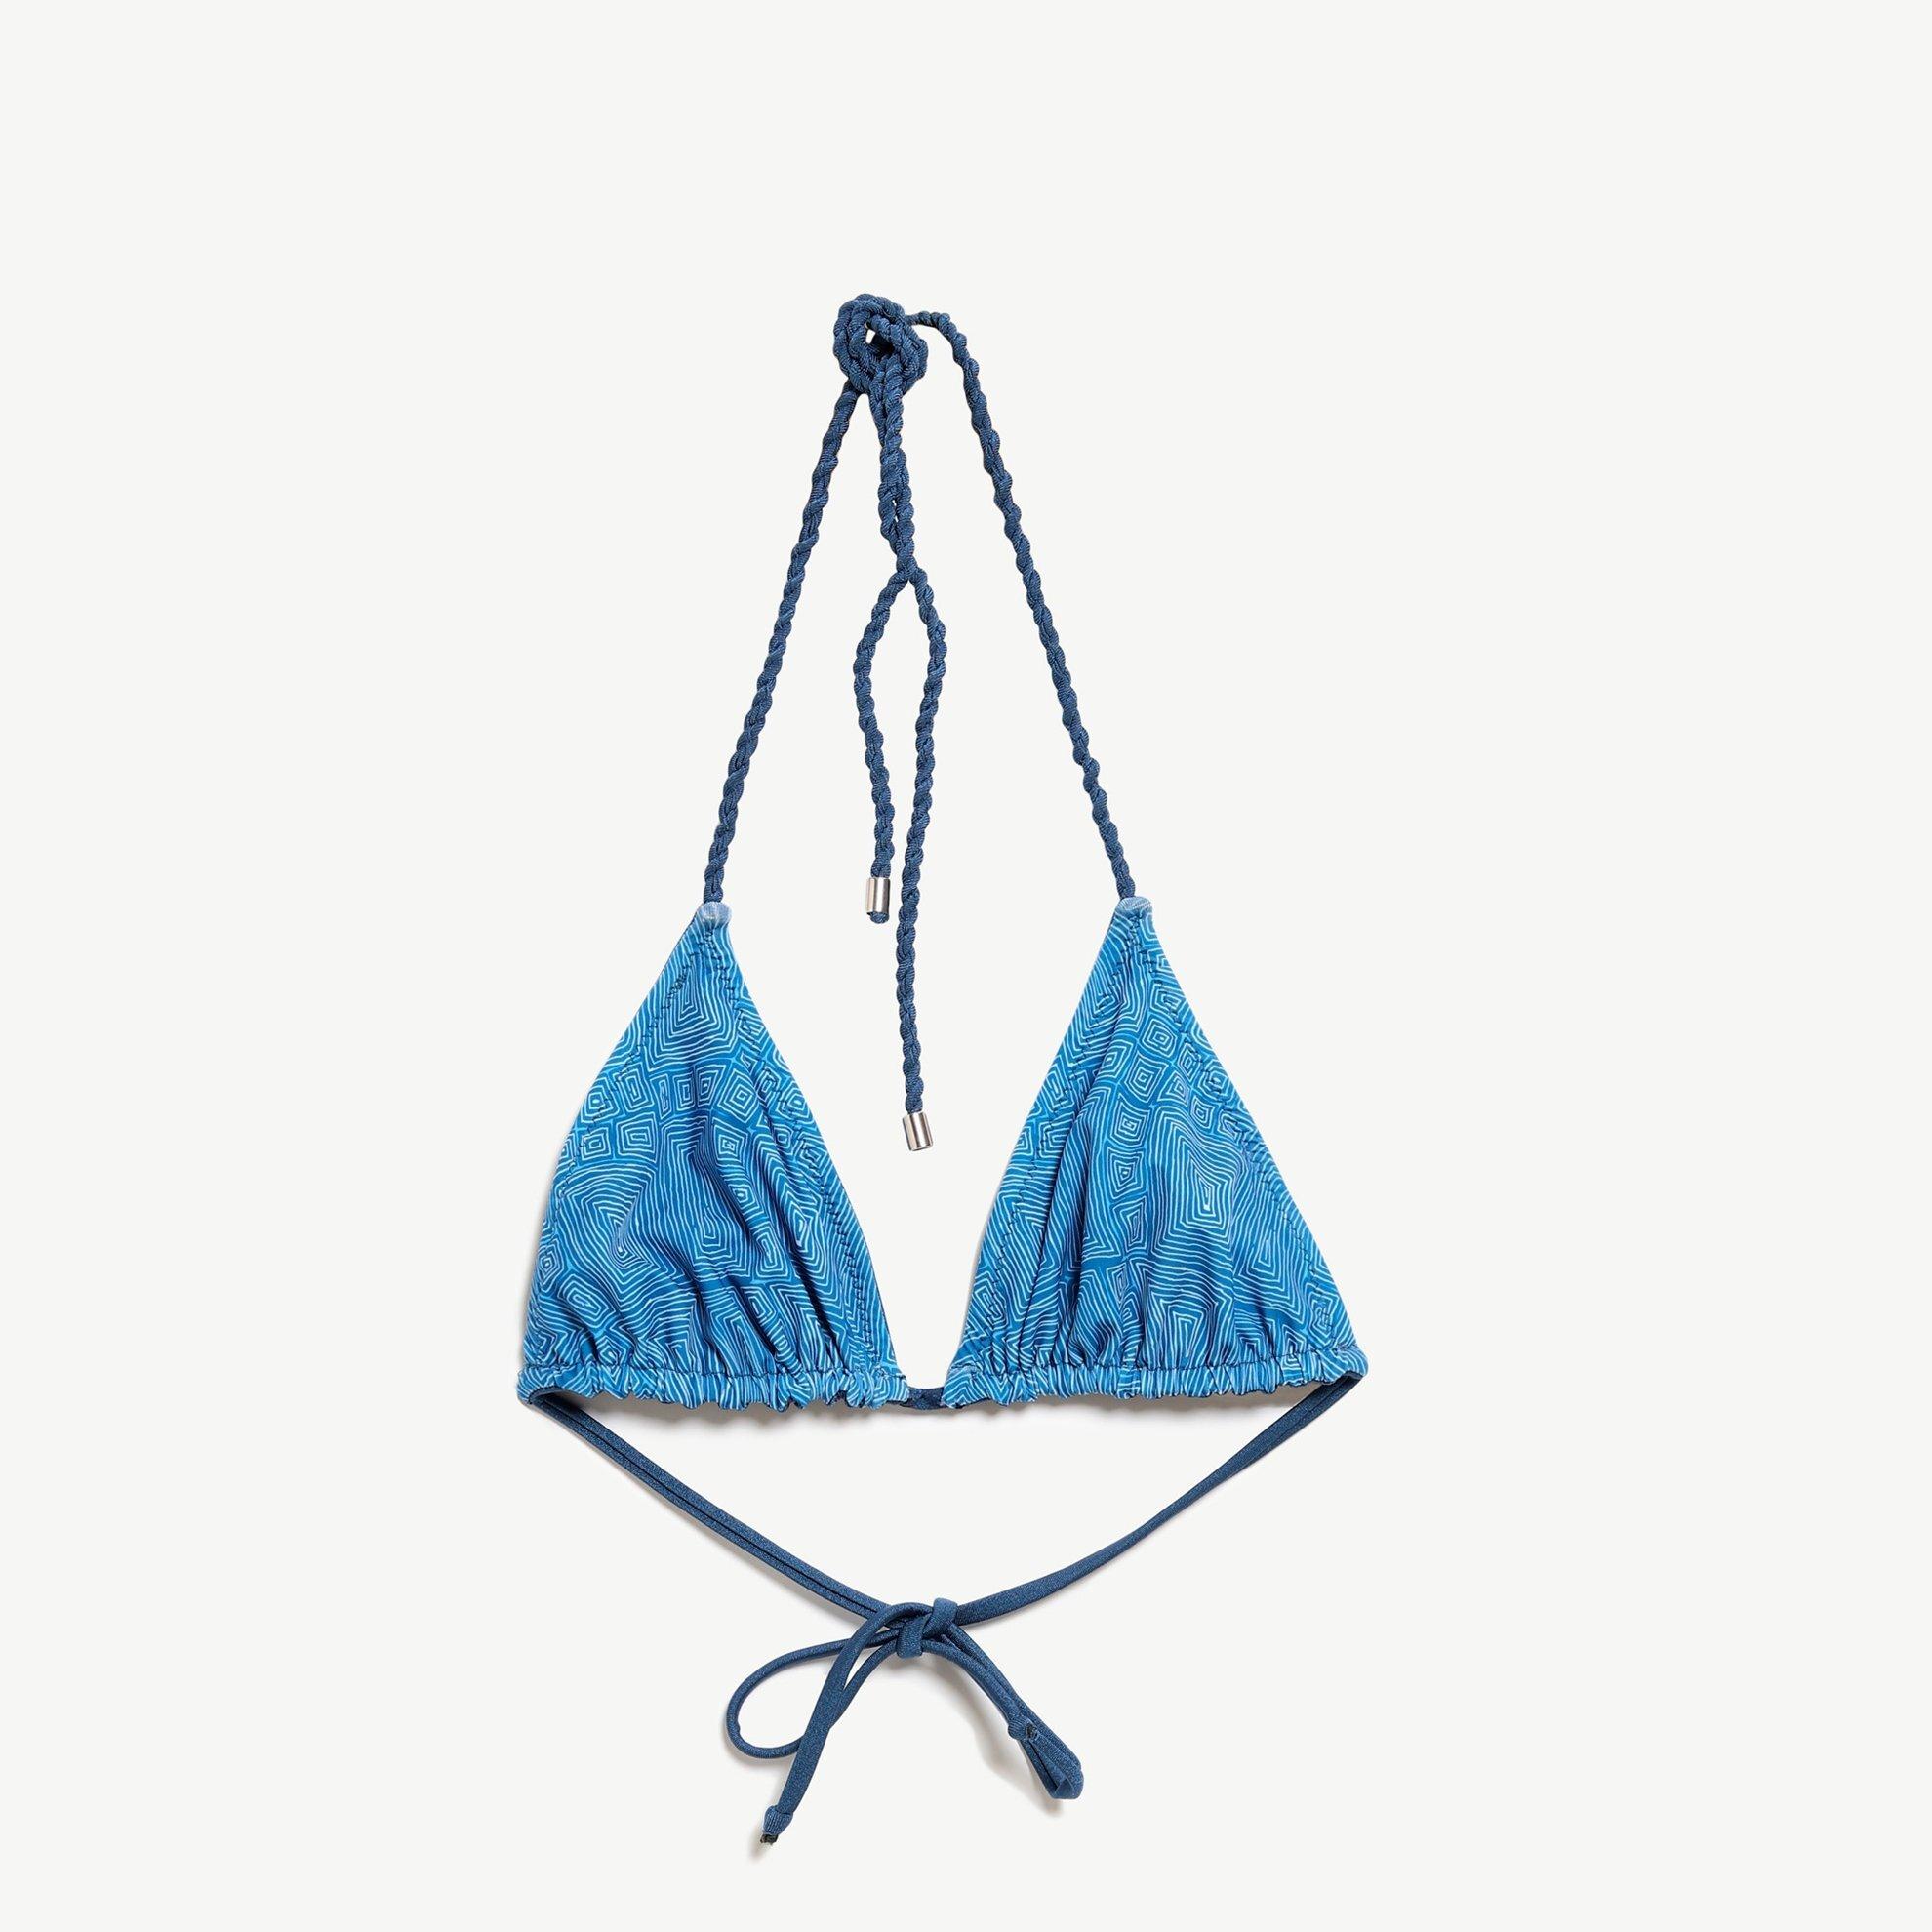 Tie Detailed Triangle Breast   Bikini Top